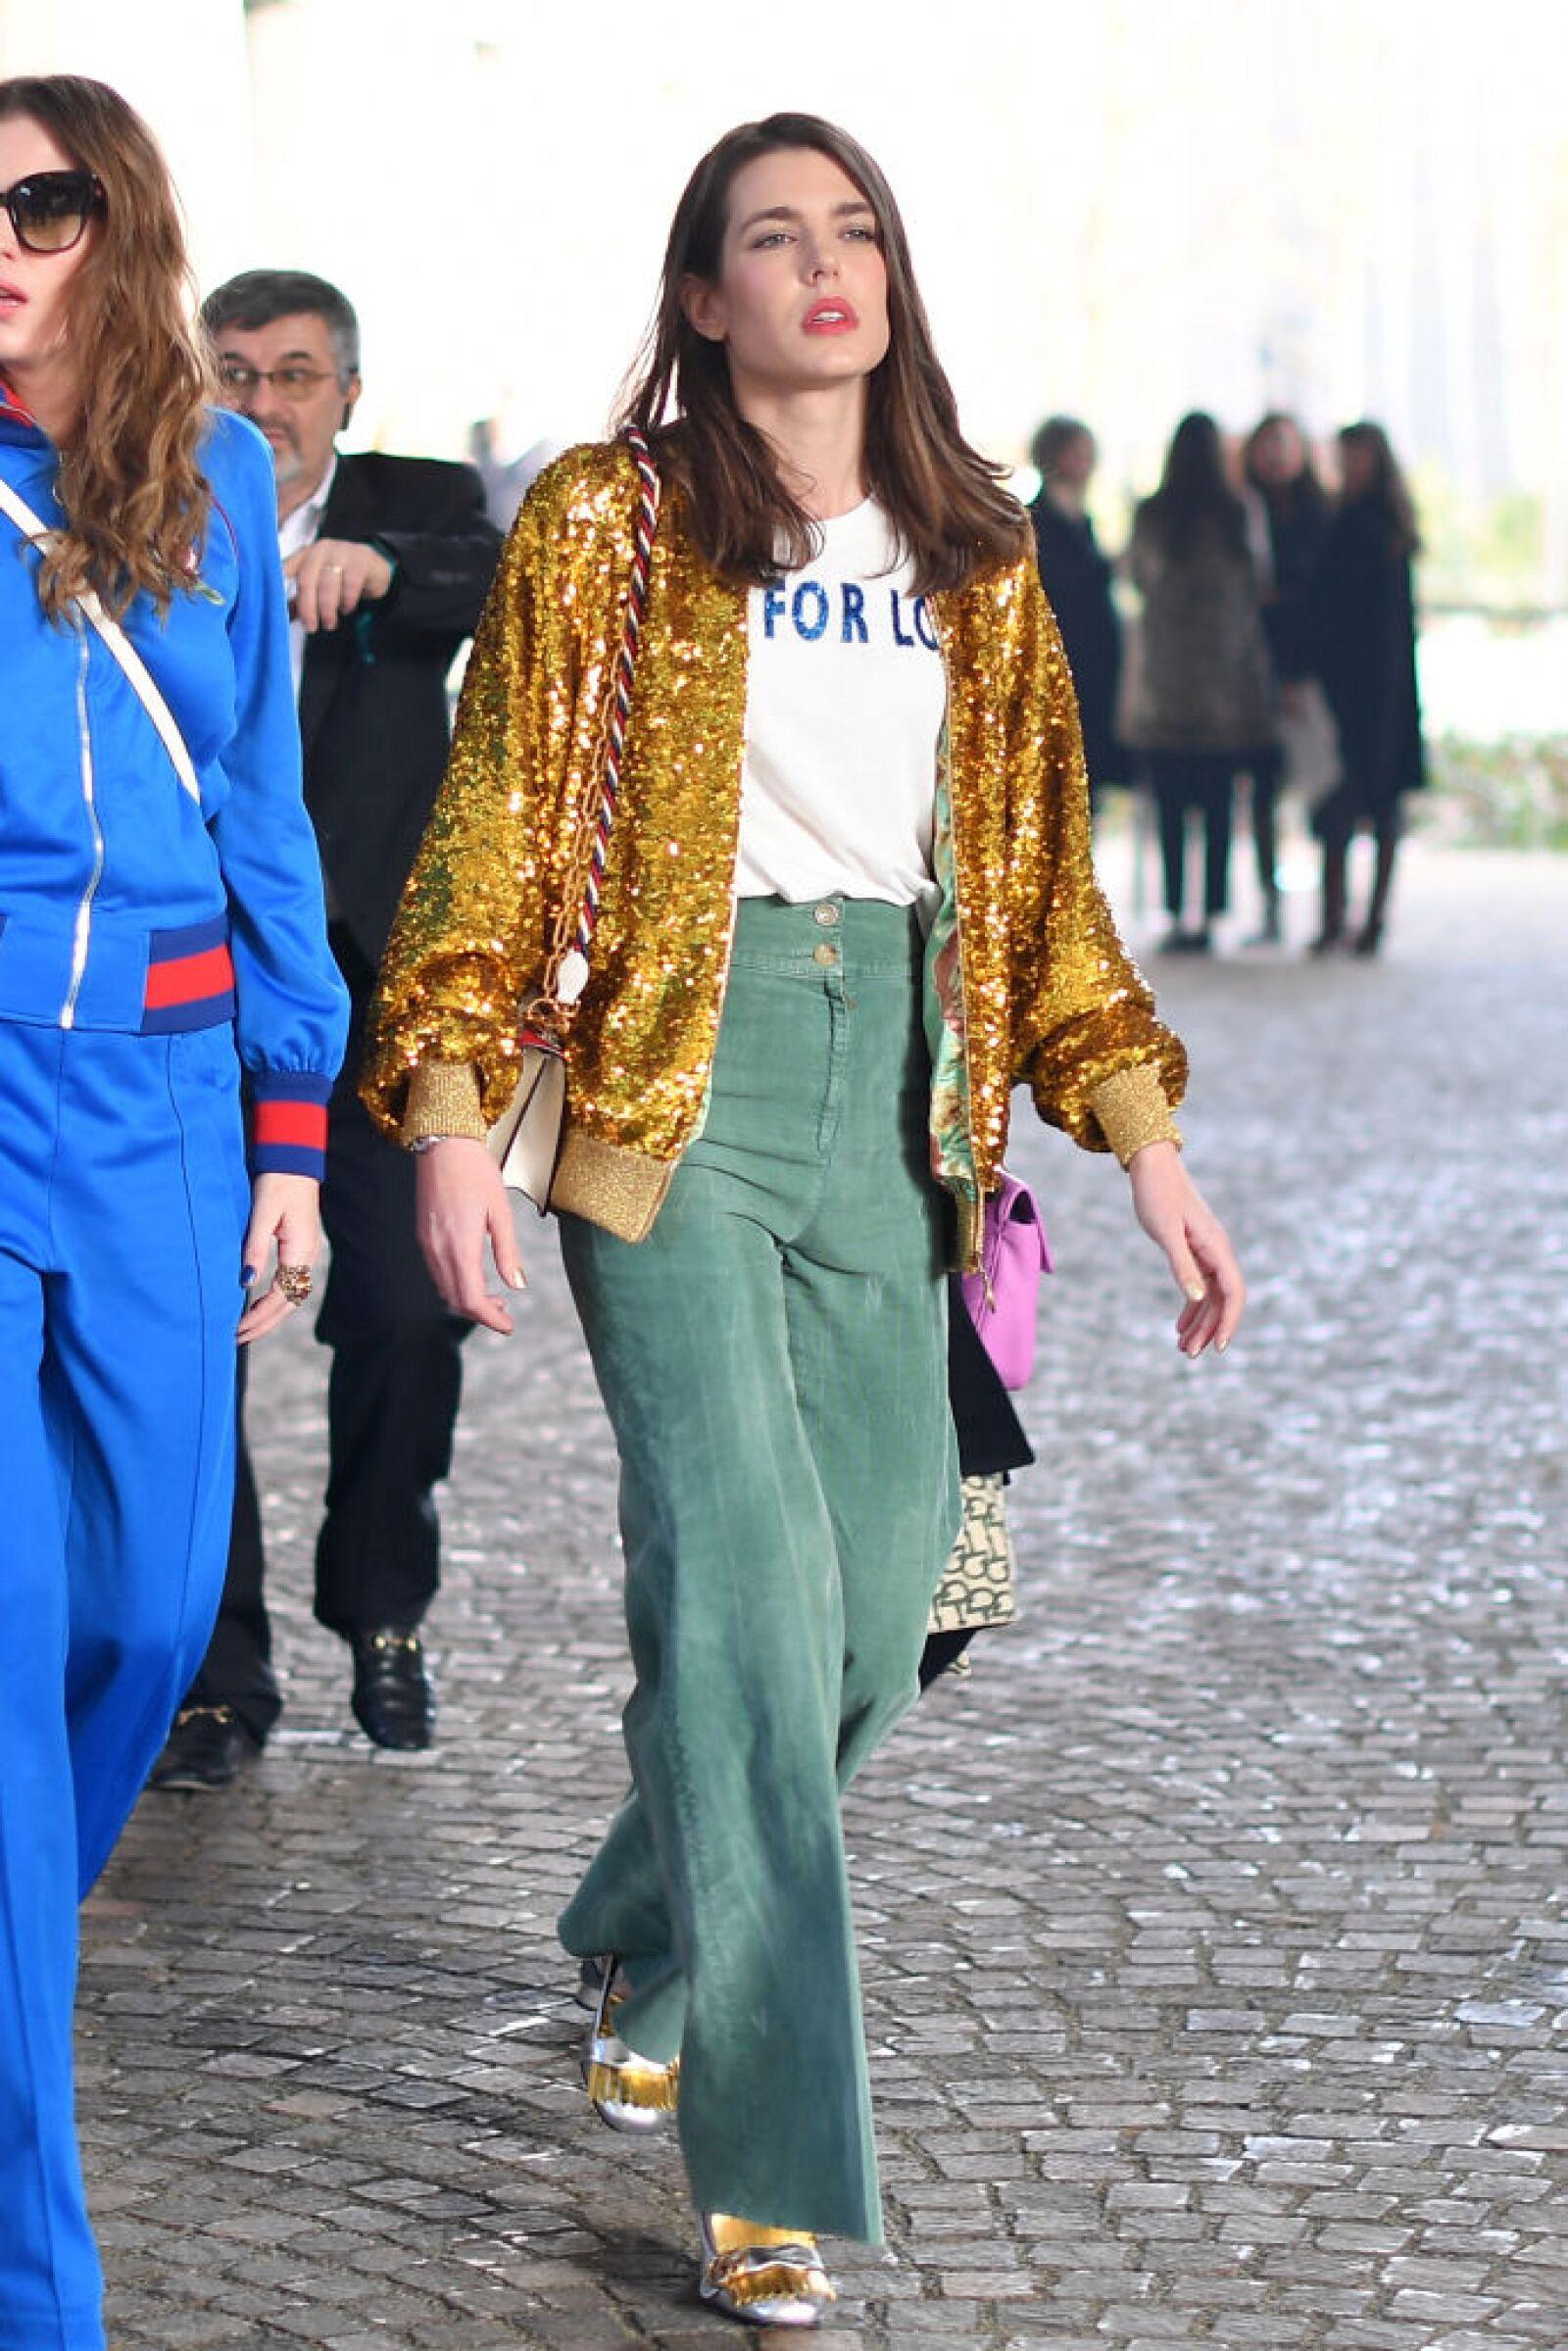 Gucci - Arrivals - Milan Fashion Week Fall/Winter 2017/18